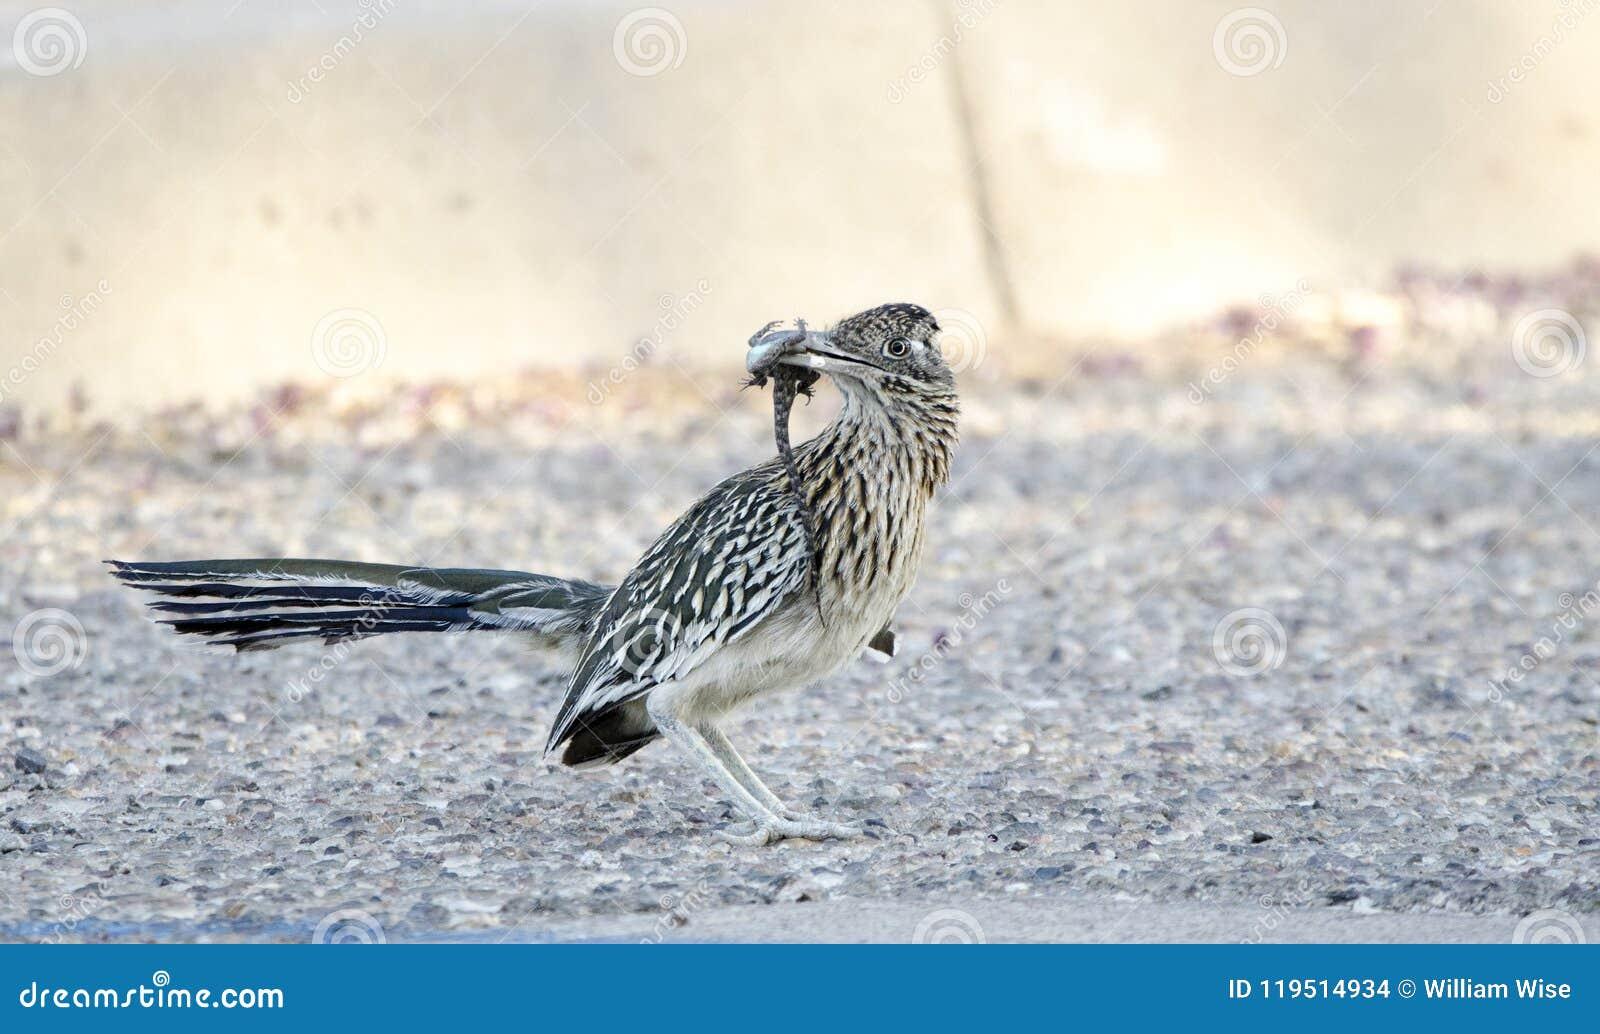 Greater Roadrunner bird with lizard in beak, Tucson Arizona, USA